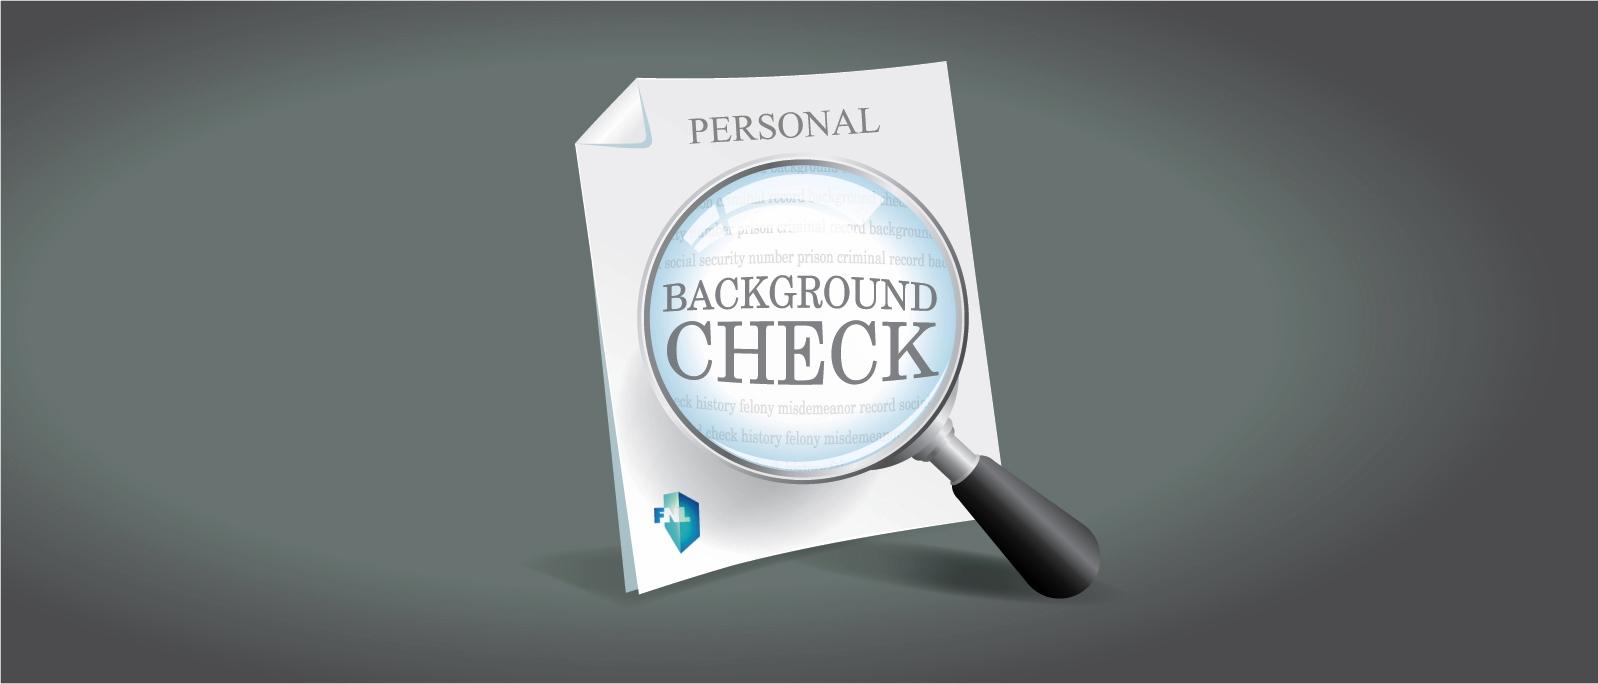 Fbi inked fingerprints fnl fingerprints notary public live obtaining your own criminal background check or proof of good behavior in california falaconquin